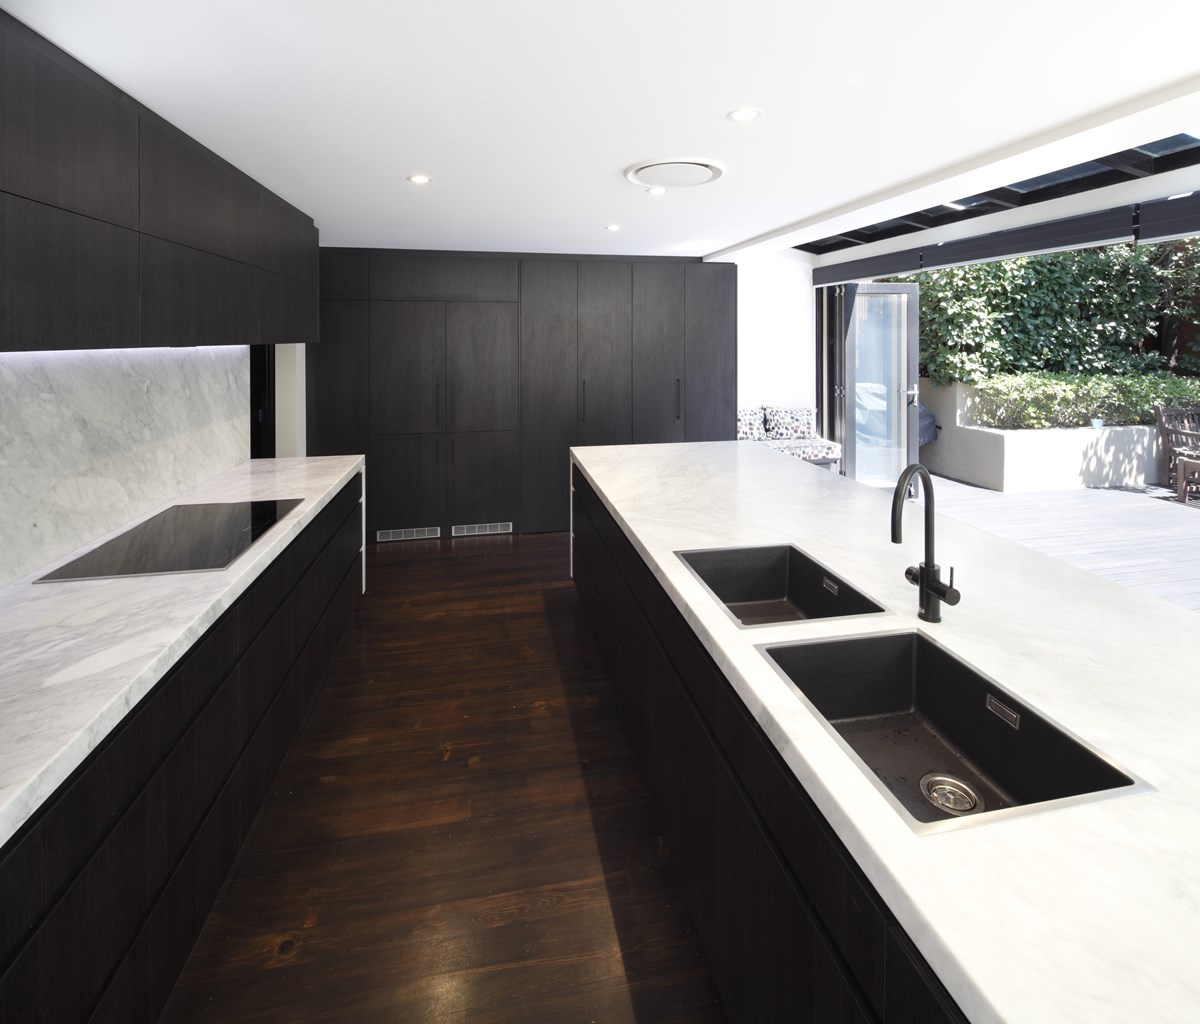 Carrara Marble Kitchen Benchtops: Natural Stone Gallery > Gallery > Quantum Quartz, Natural Stone Australia, Kitchen Benchtops